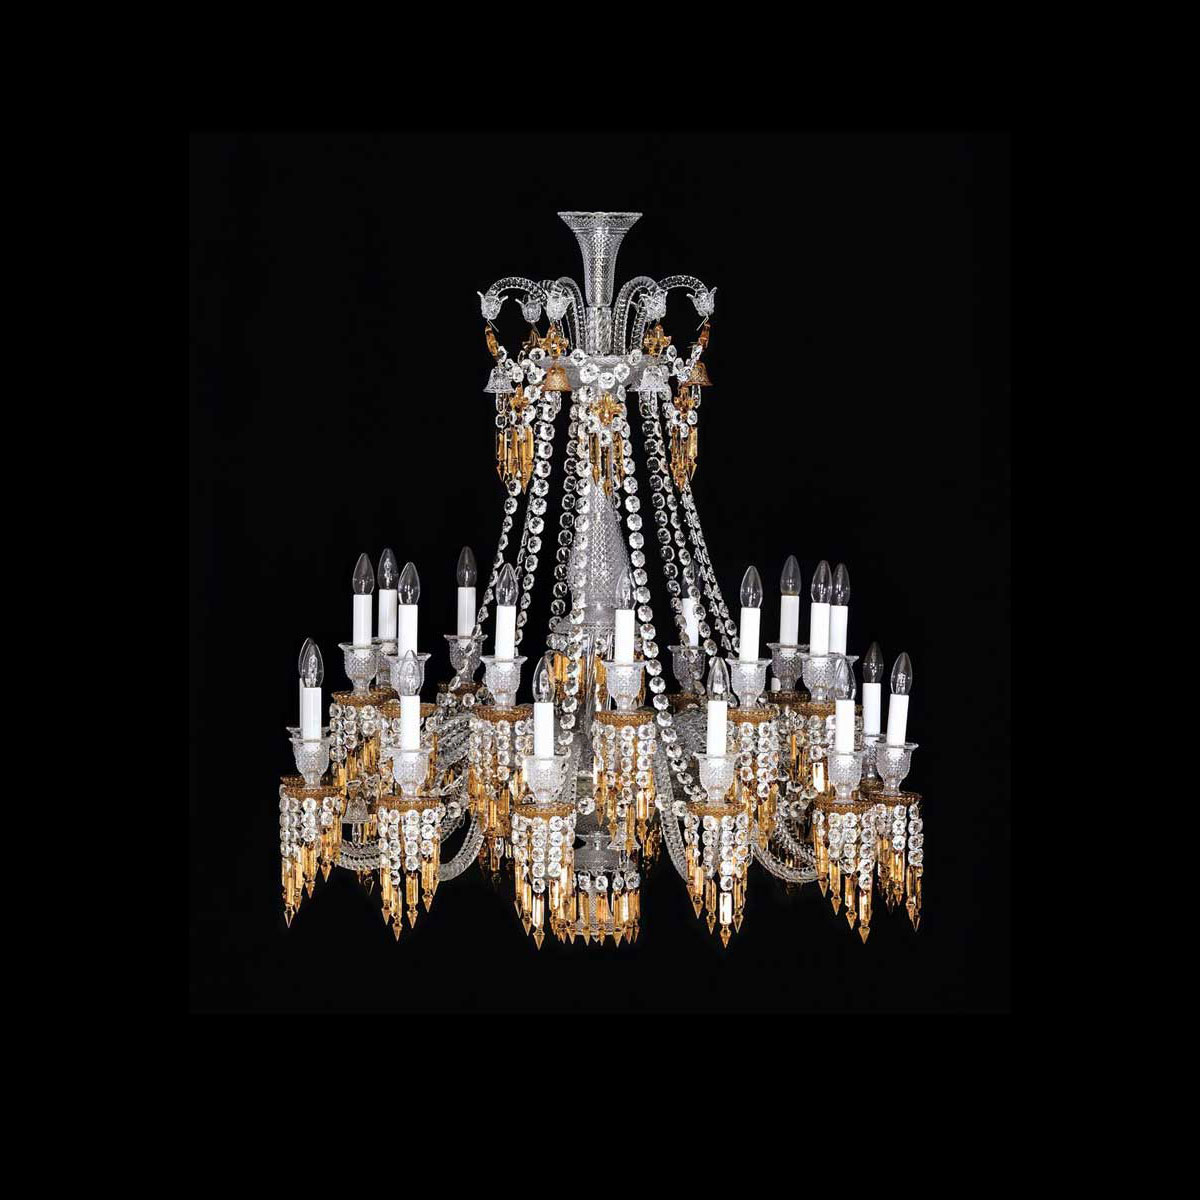 Baccarat Crystal, Zenith Charleston 24 Light Chandelier, Short